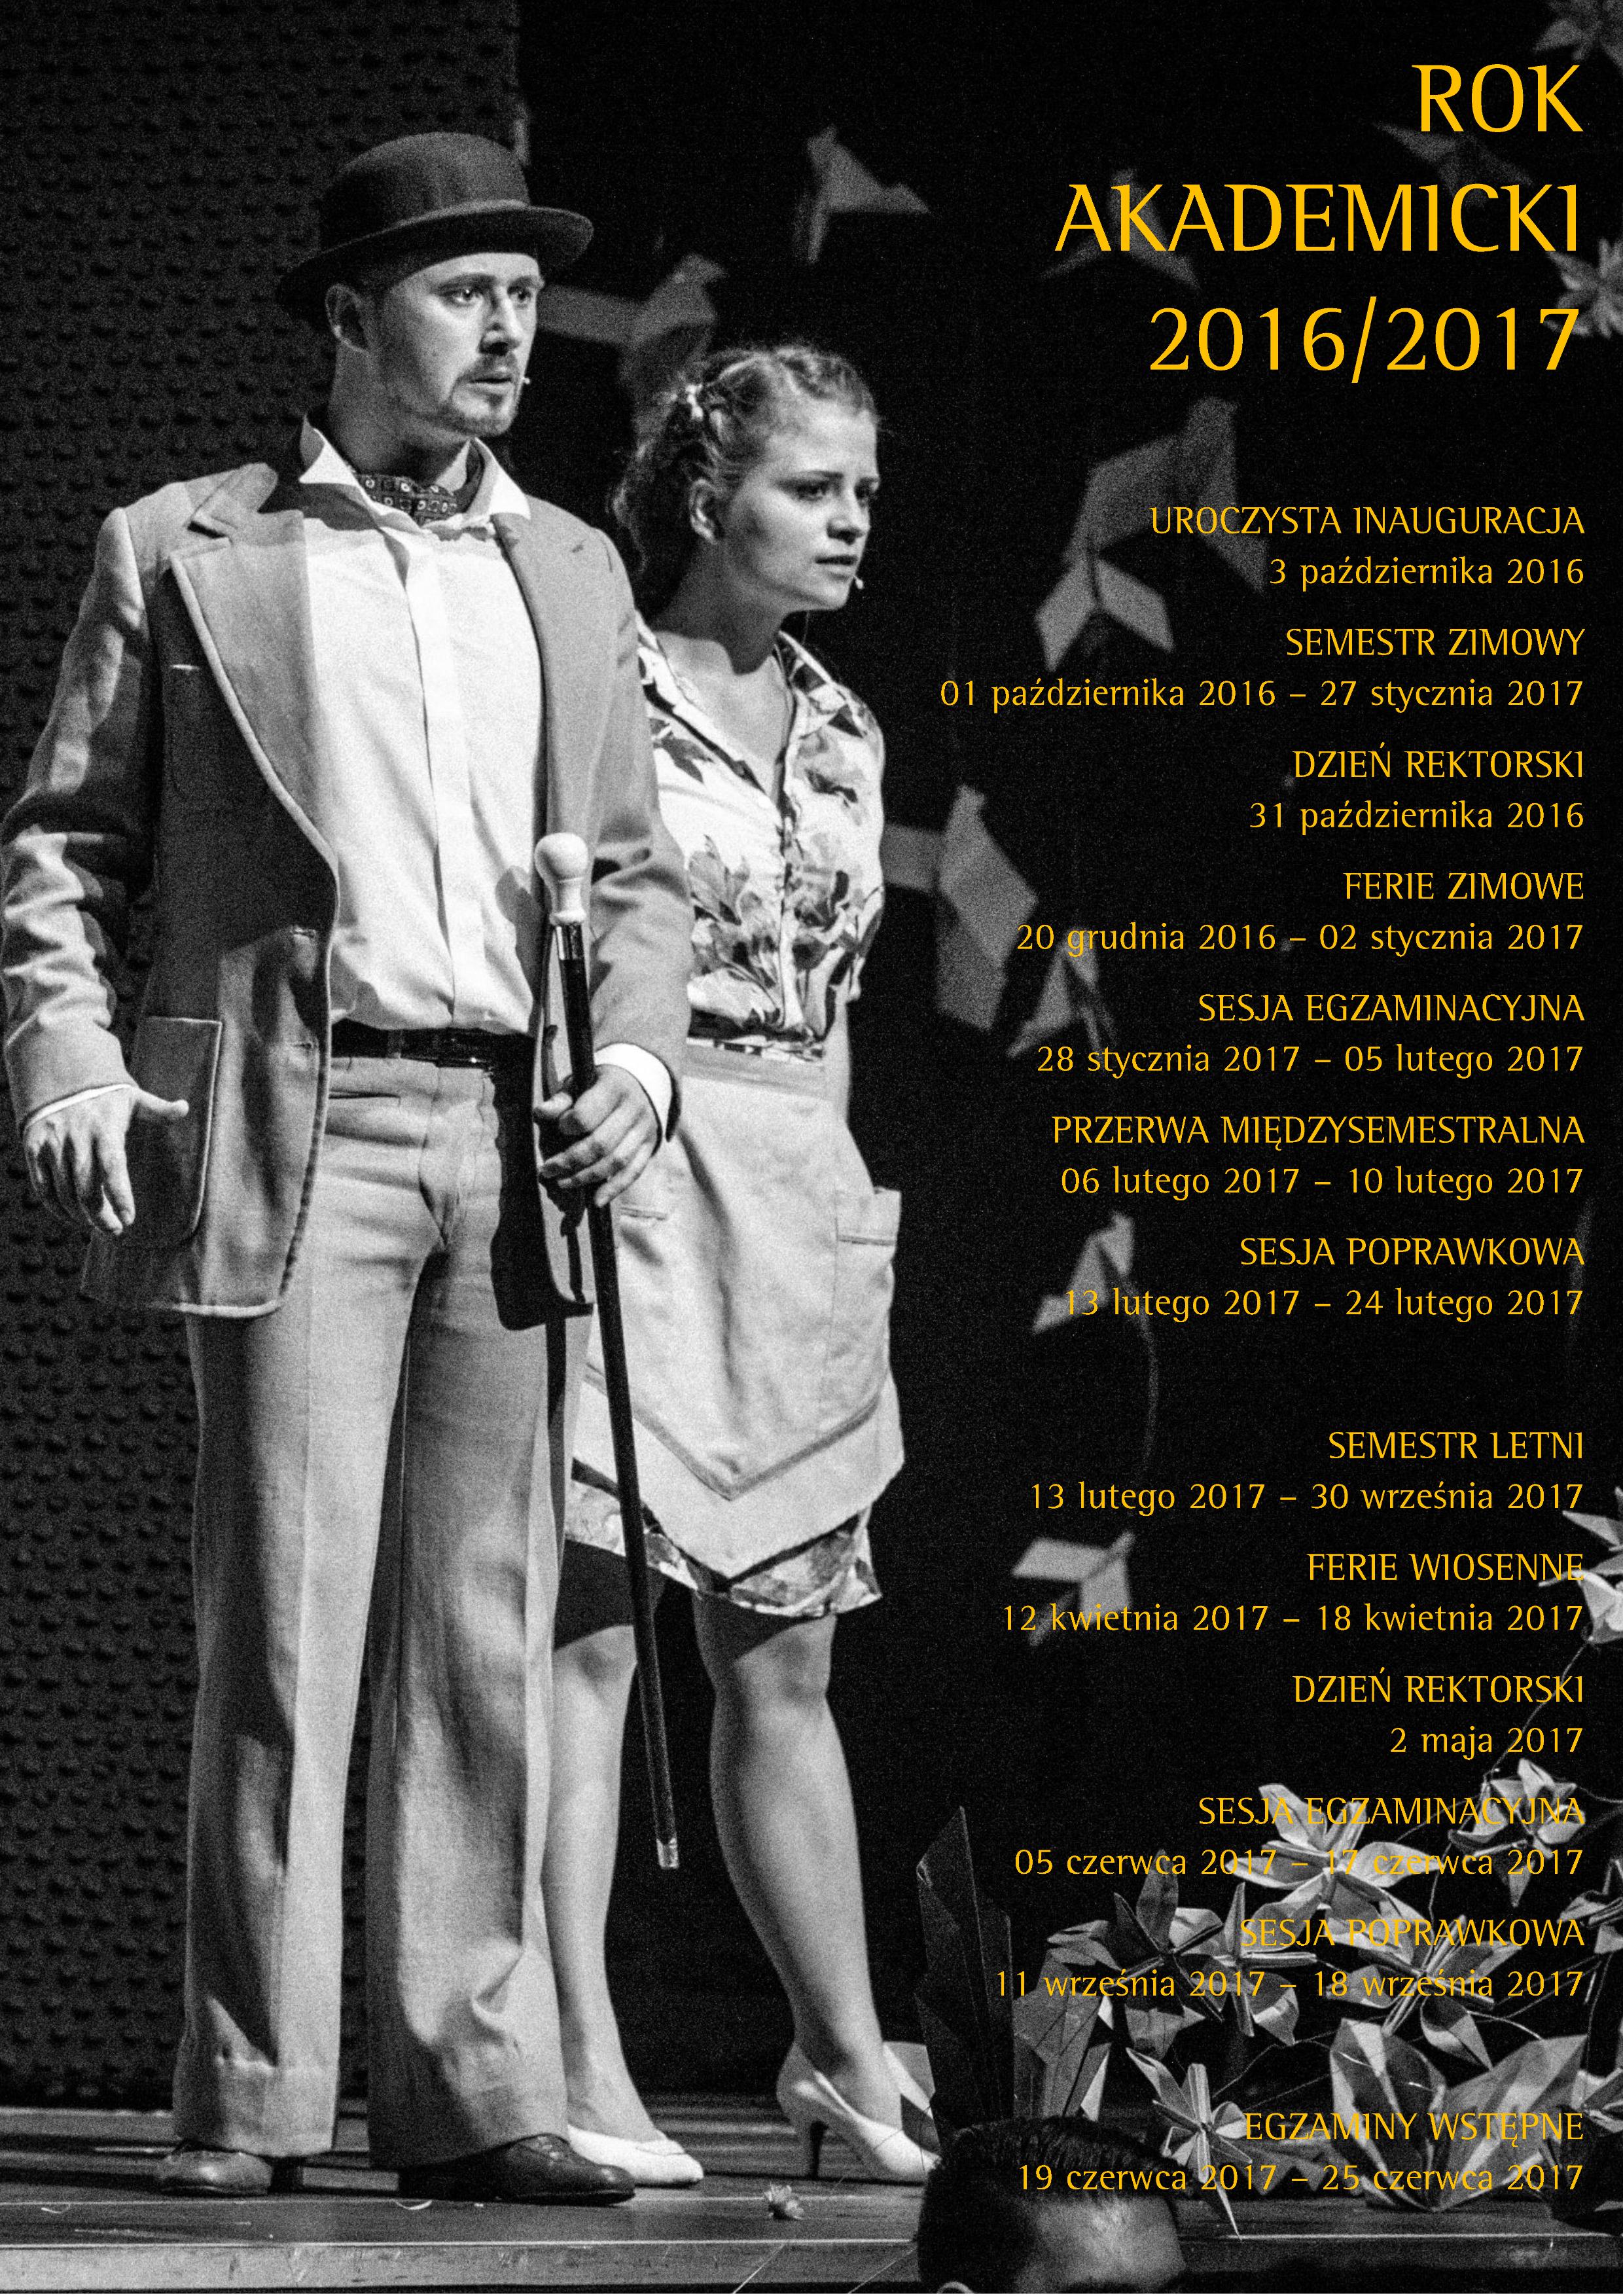 ROK-AKADEMICKI-2016-2017